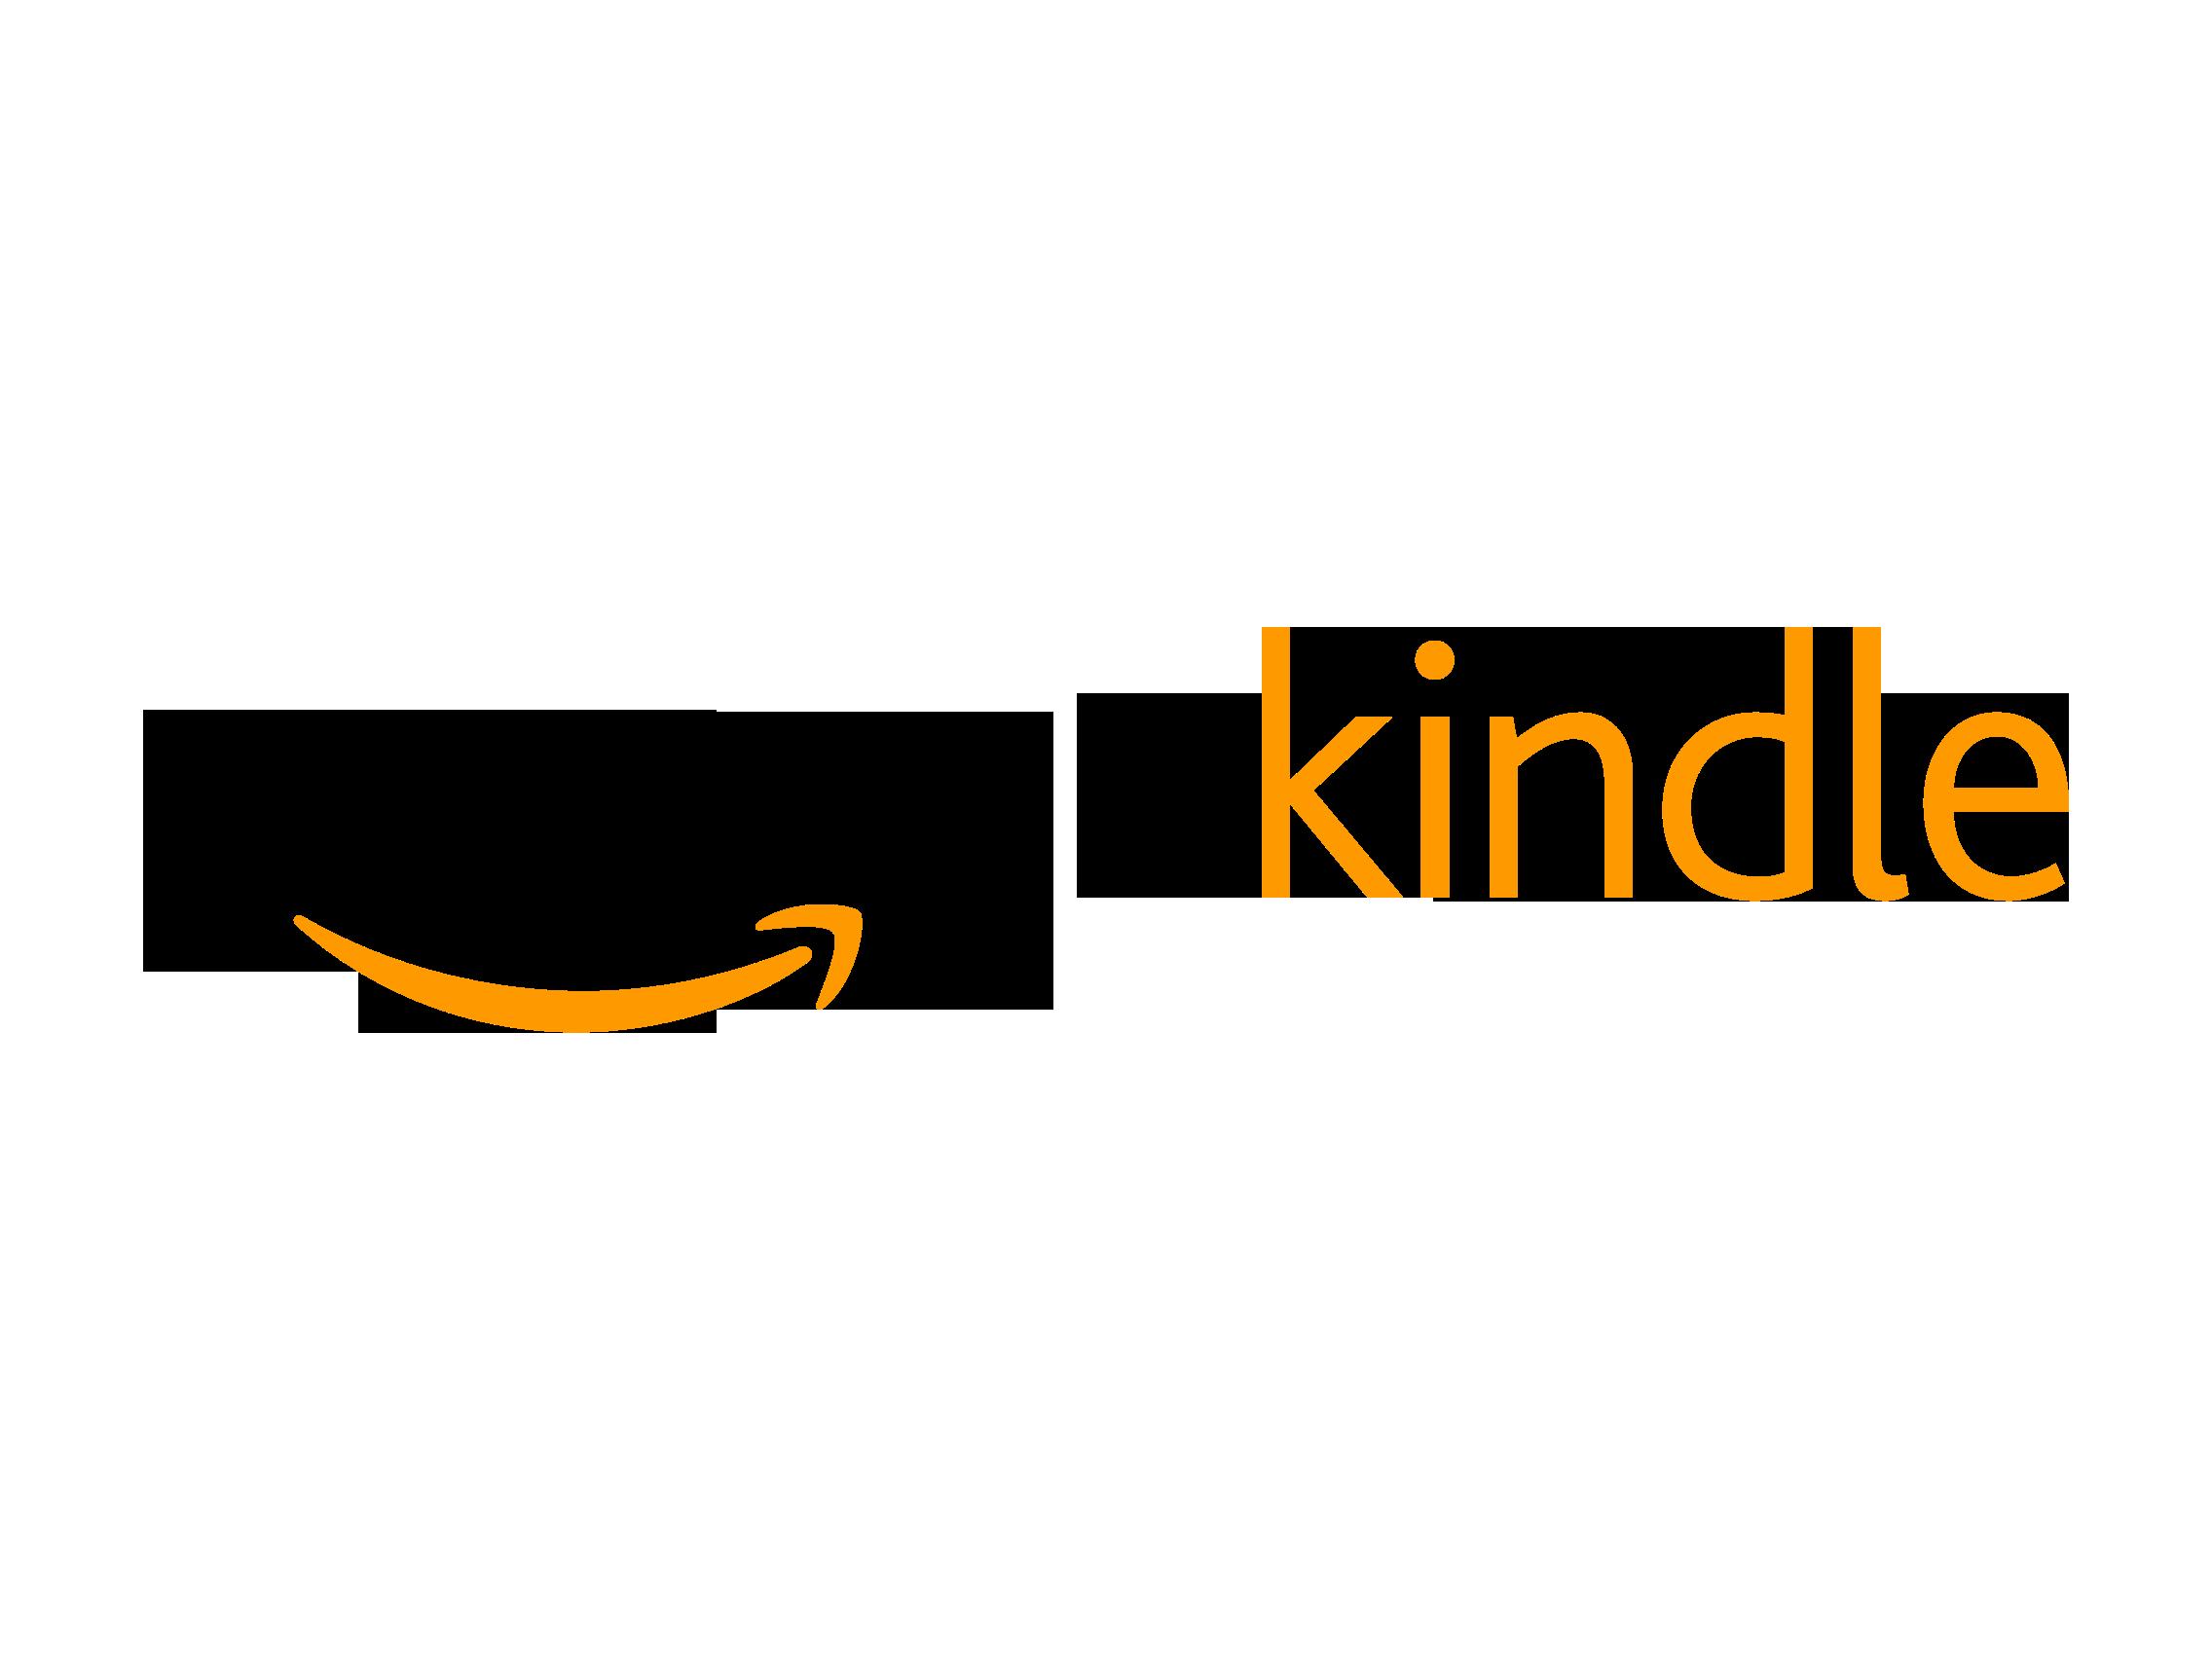 png 2272x1704 Kindle logo transparent background - Amazon Kindle PNG